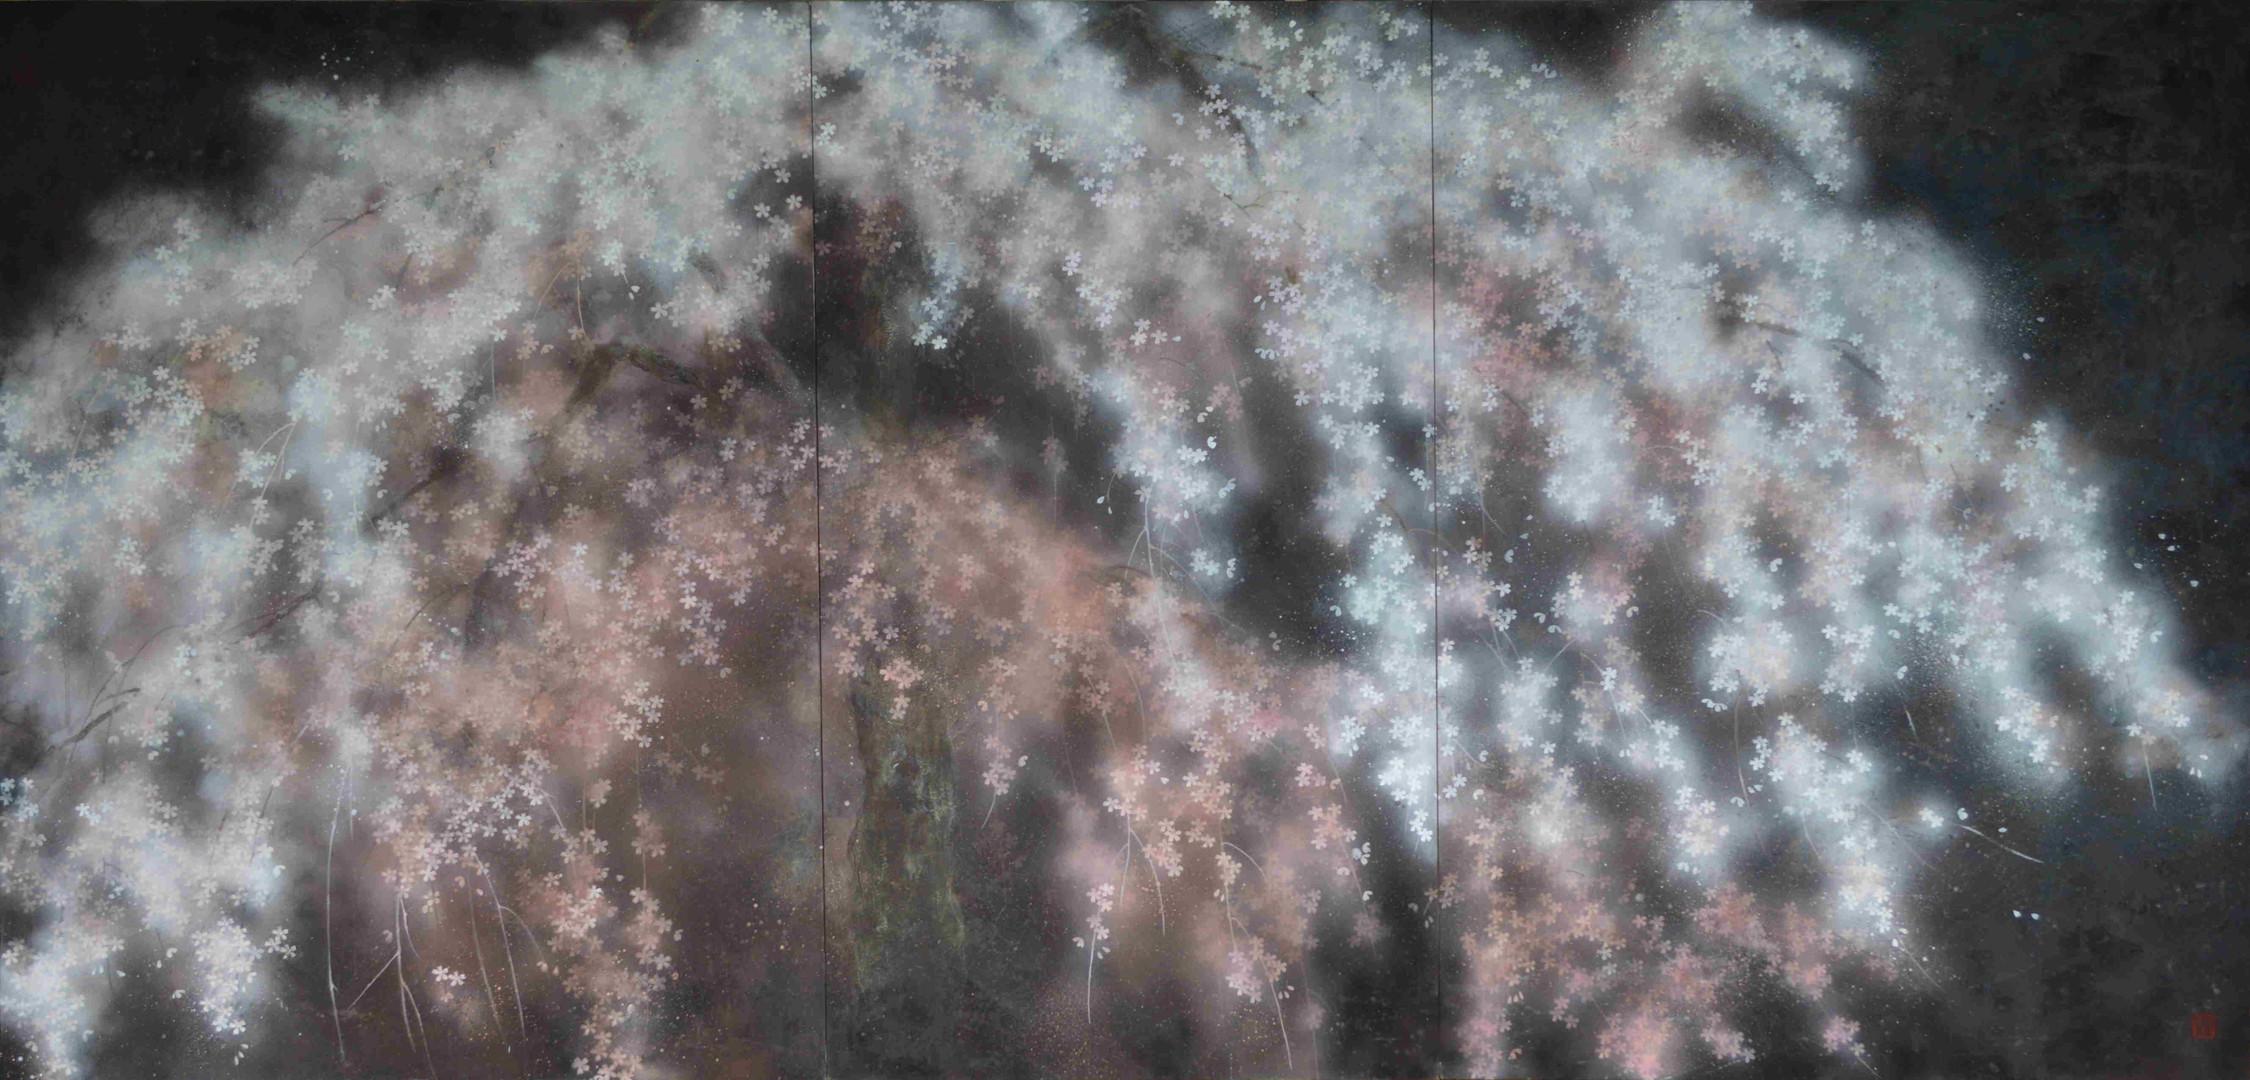 Eclat - 122 x 250 cm / 2013